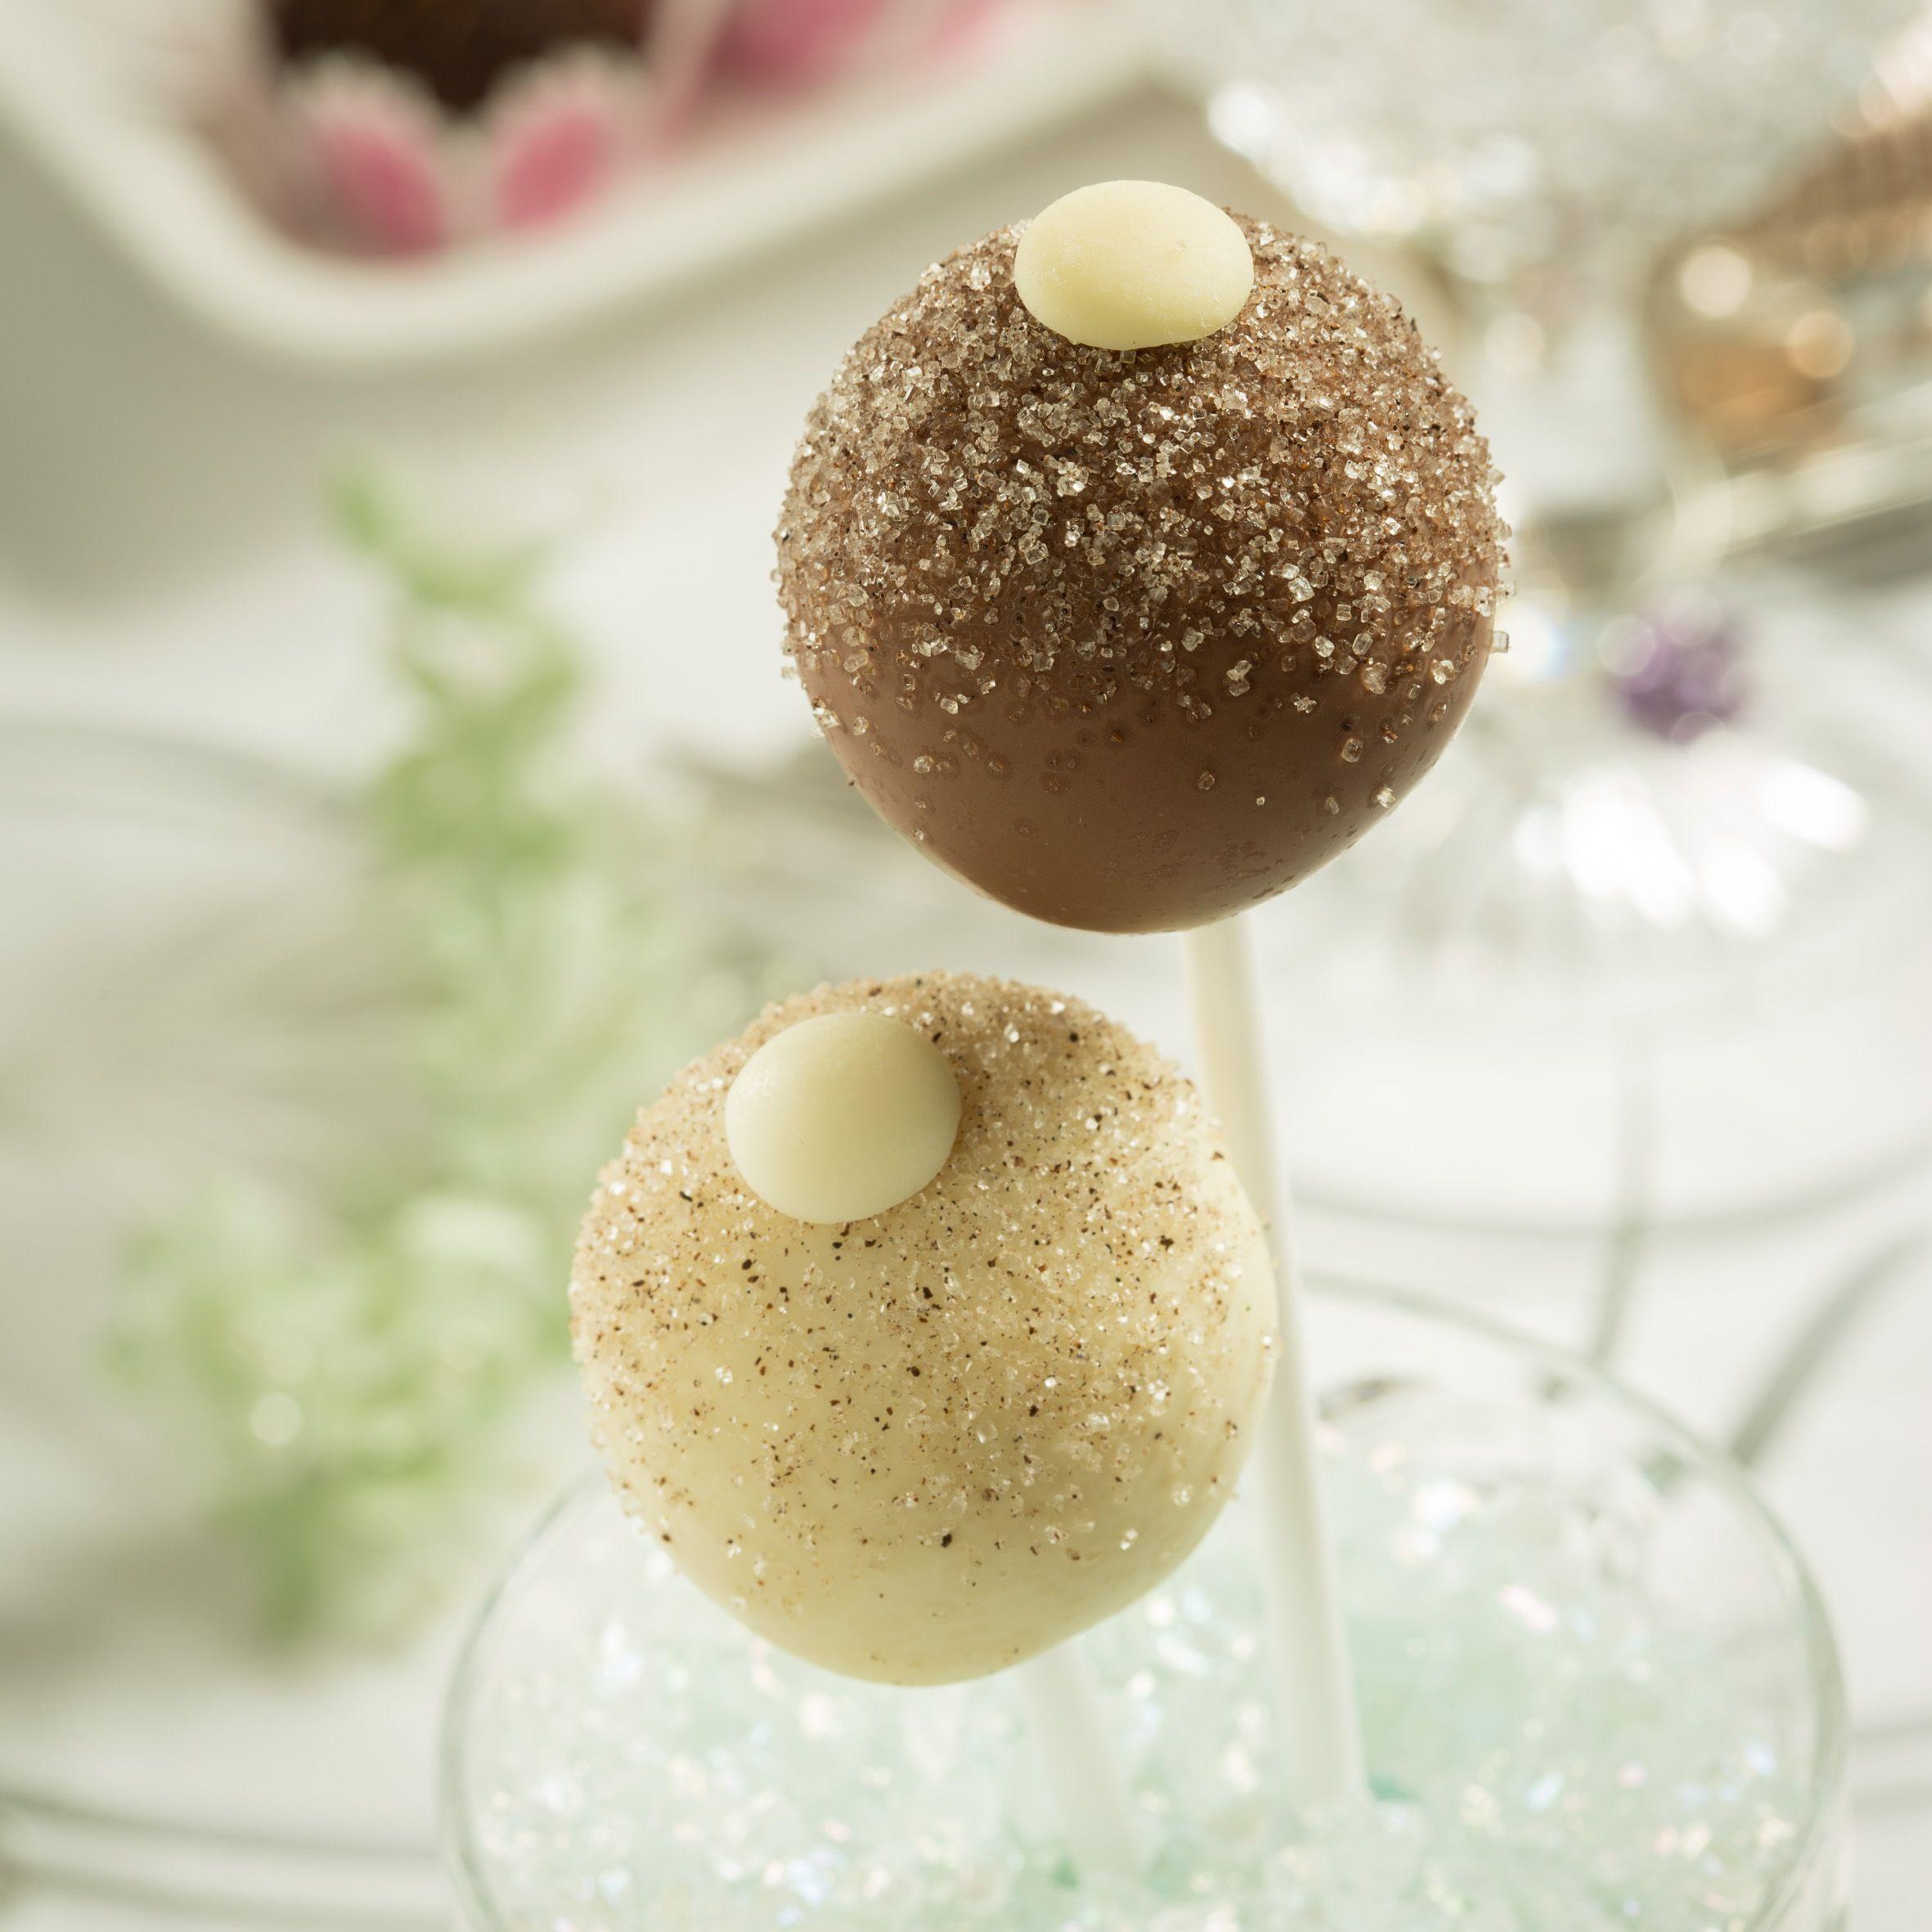 Classic vanilla gluten free sponge cake blended with